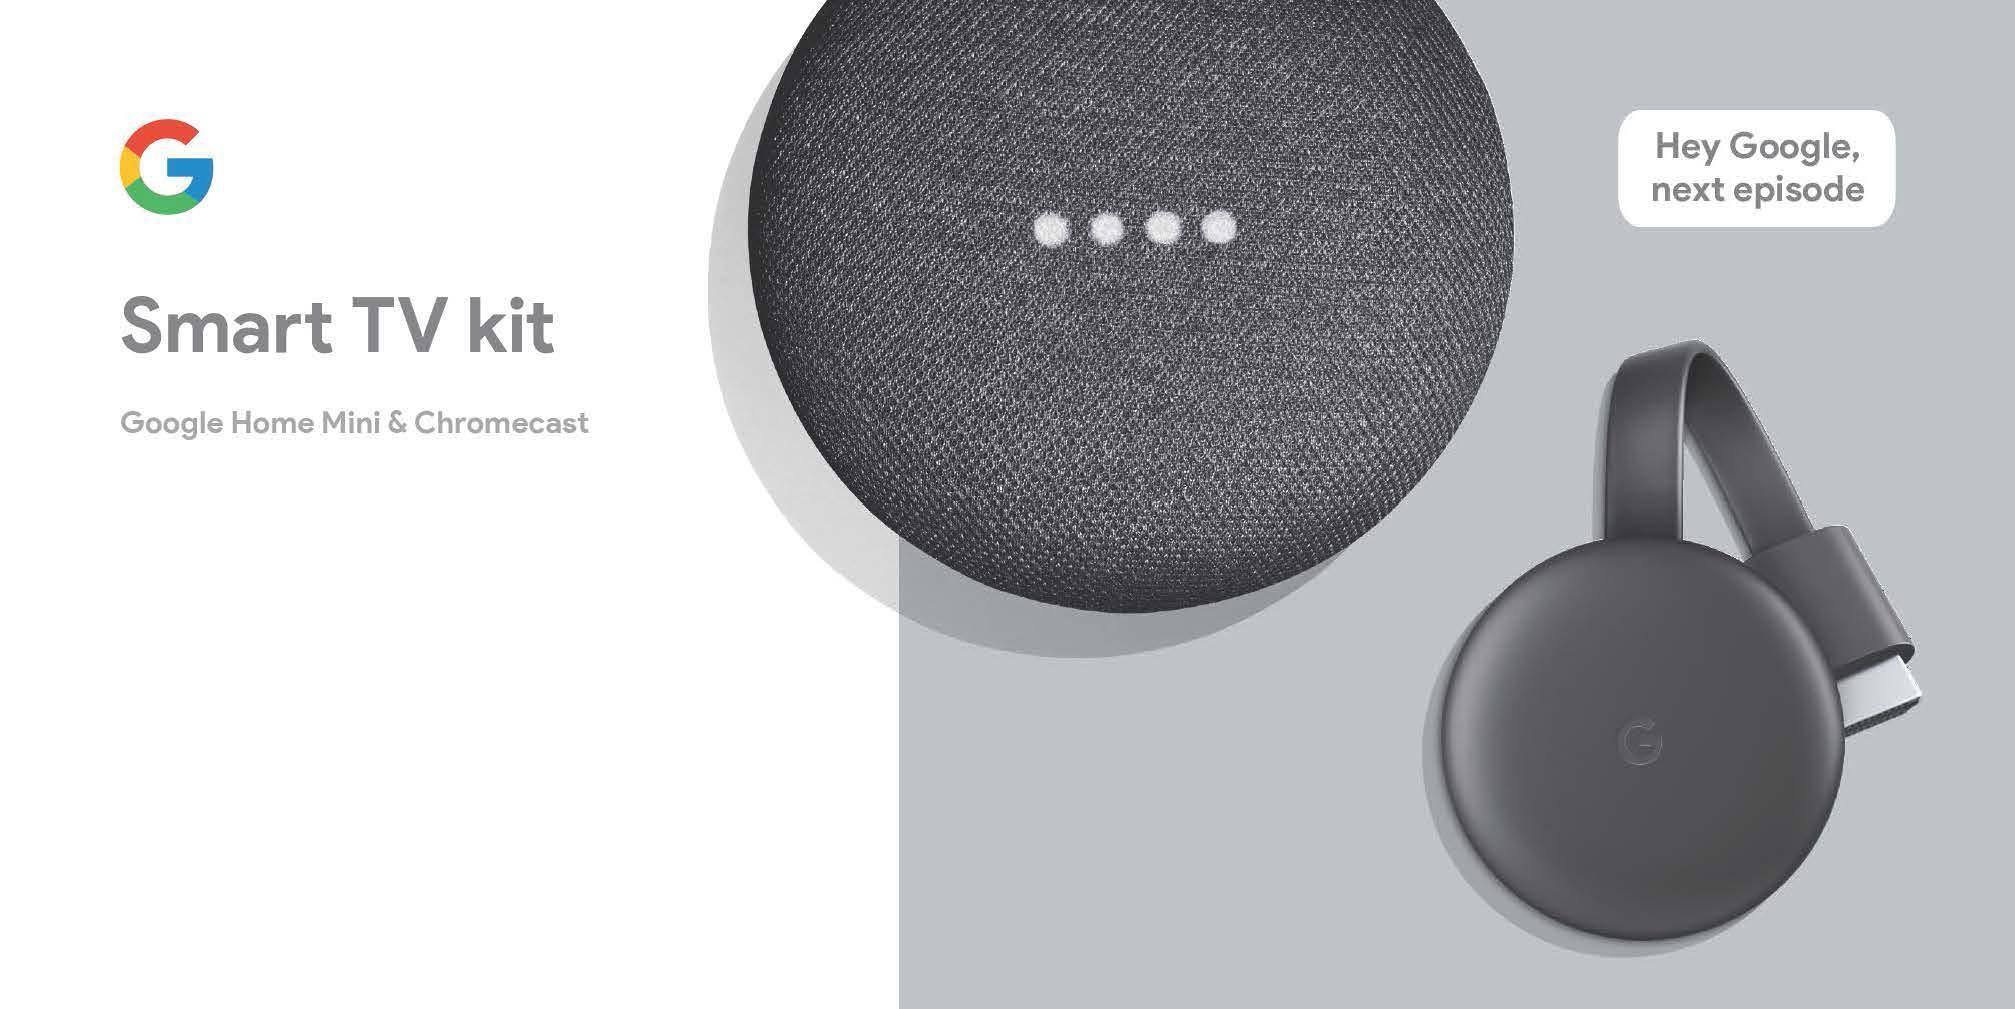 Google Smart TV Kit: Google Home Mini And 3rd Gen Chromecast